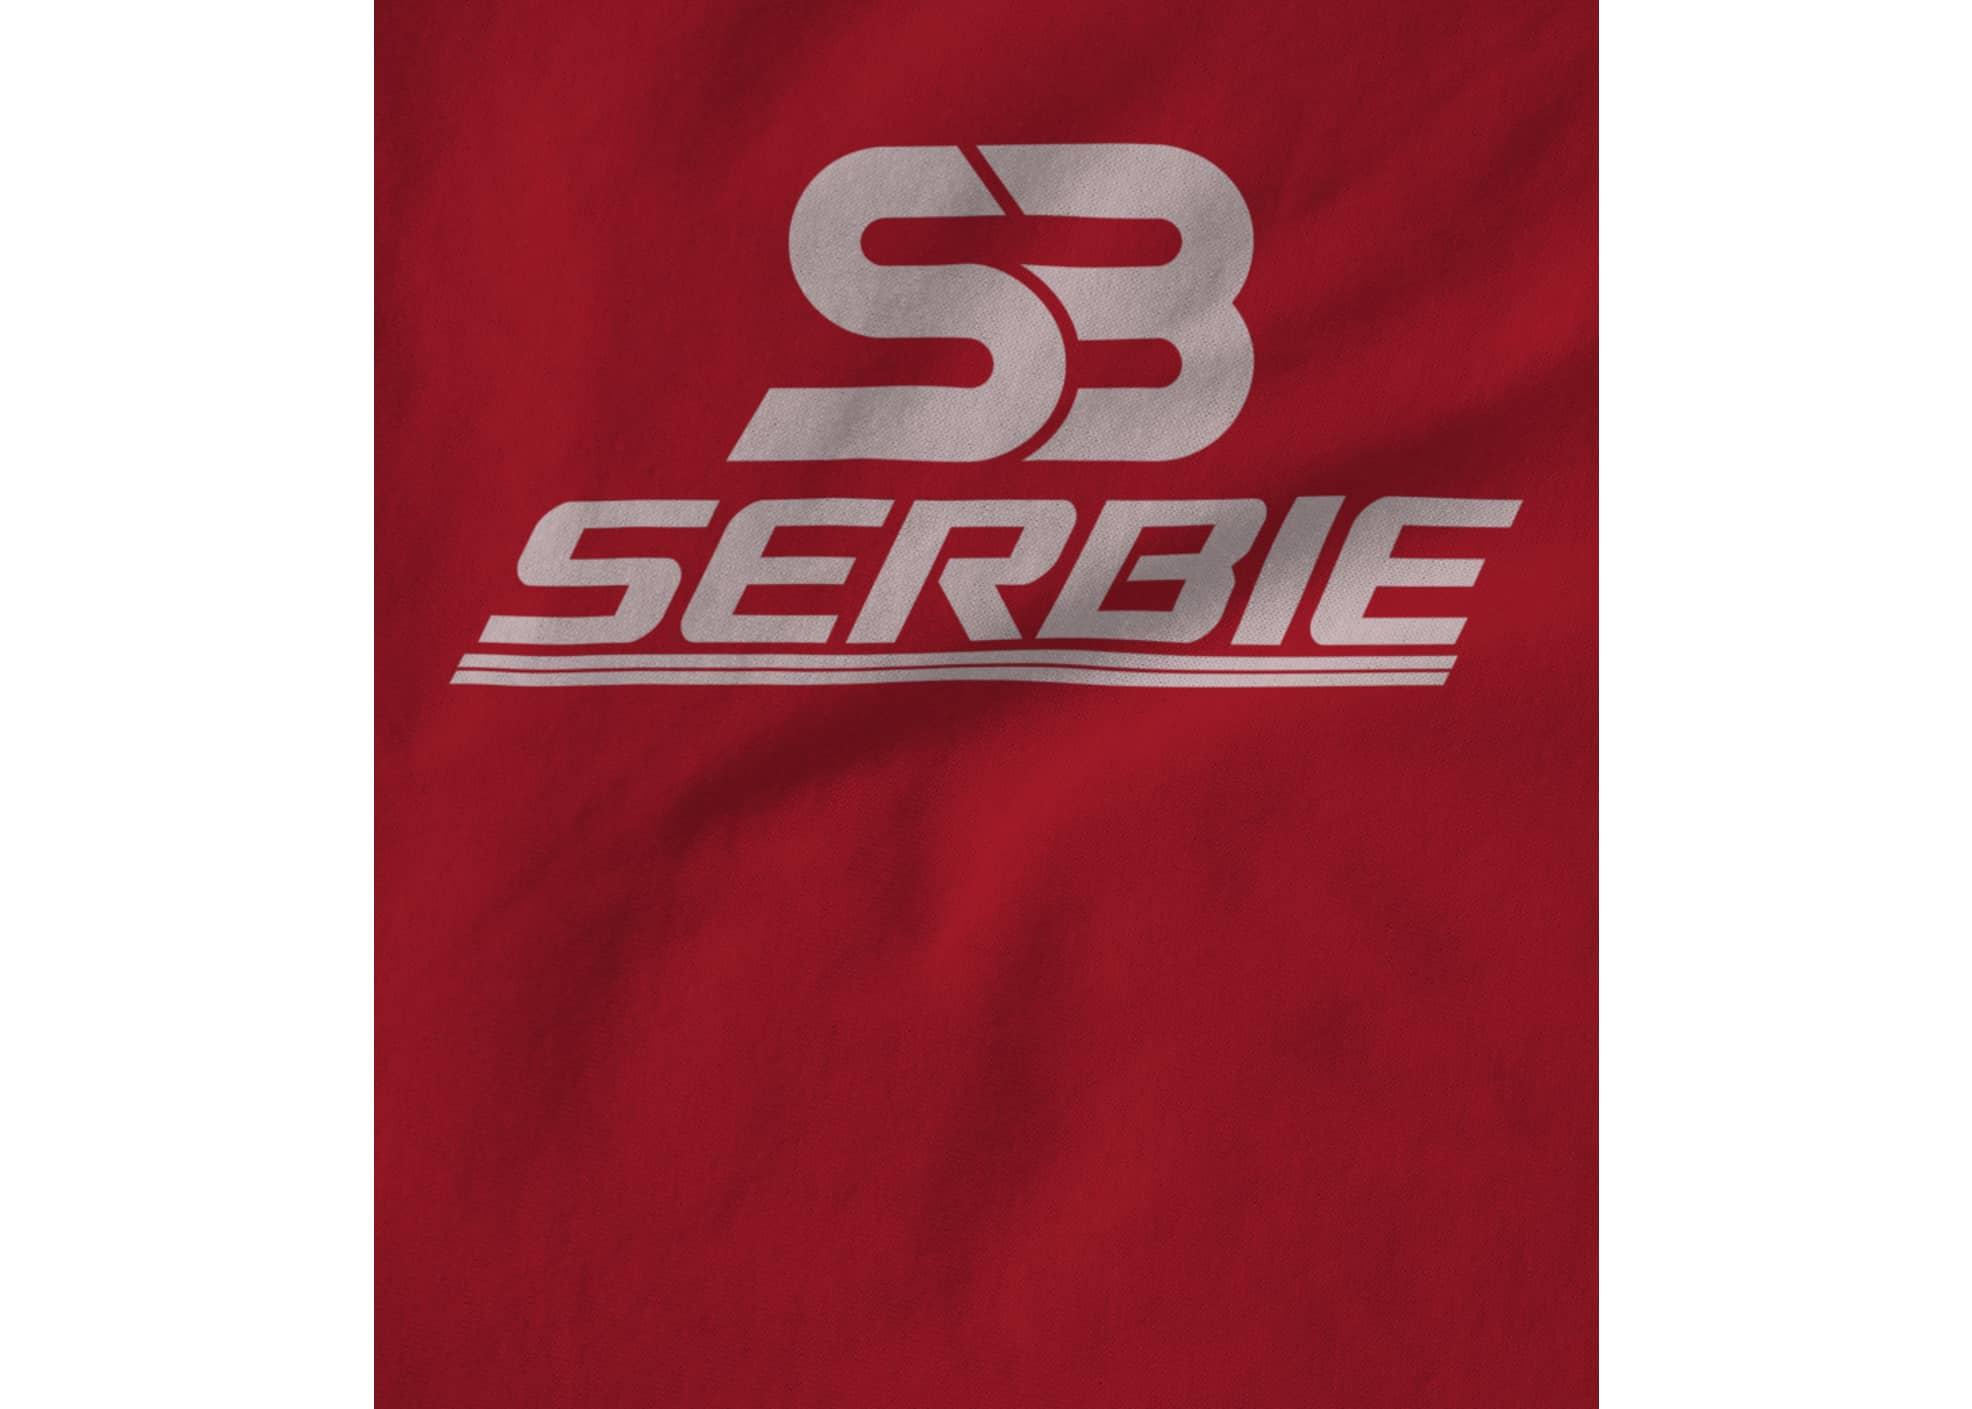 Serbie serbielogo5 1592796963